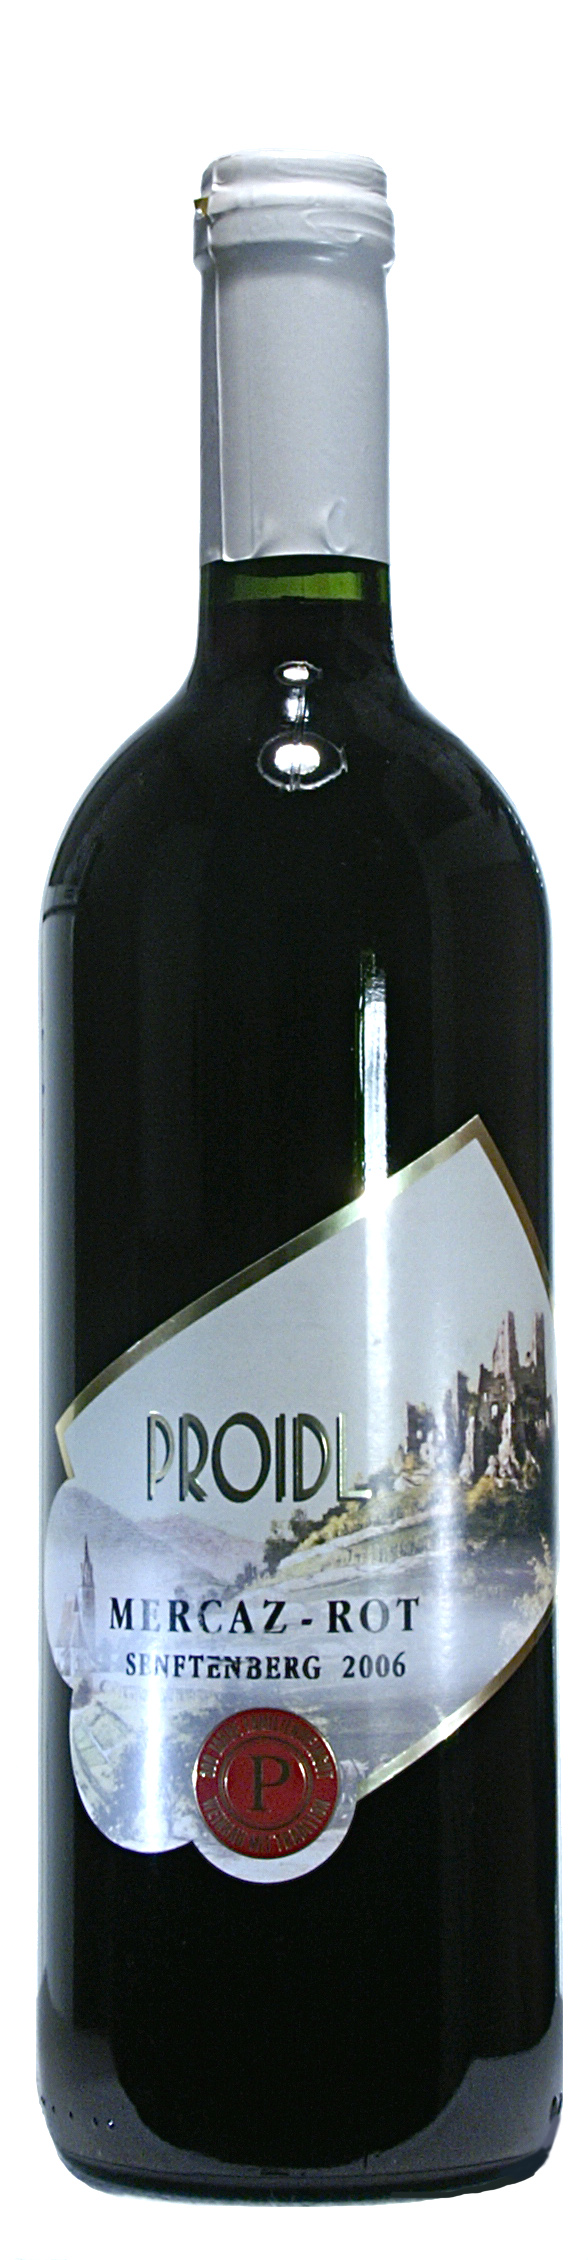 Cuvée Mercaz (Merlot, Cabernet, Zweigelt)